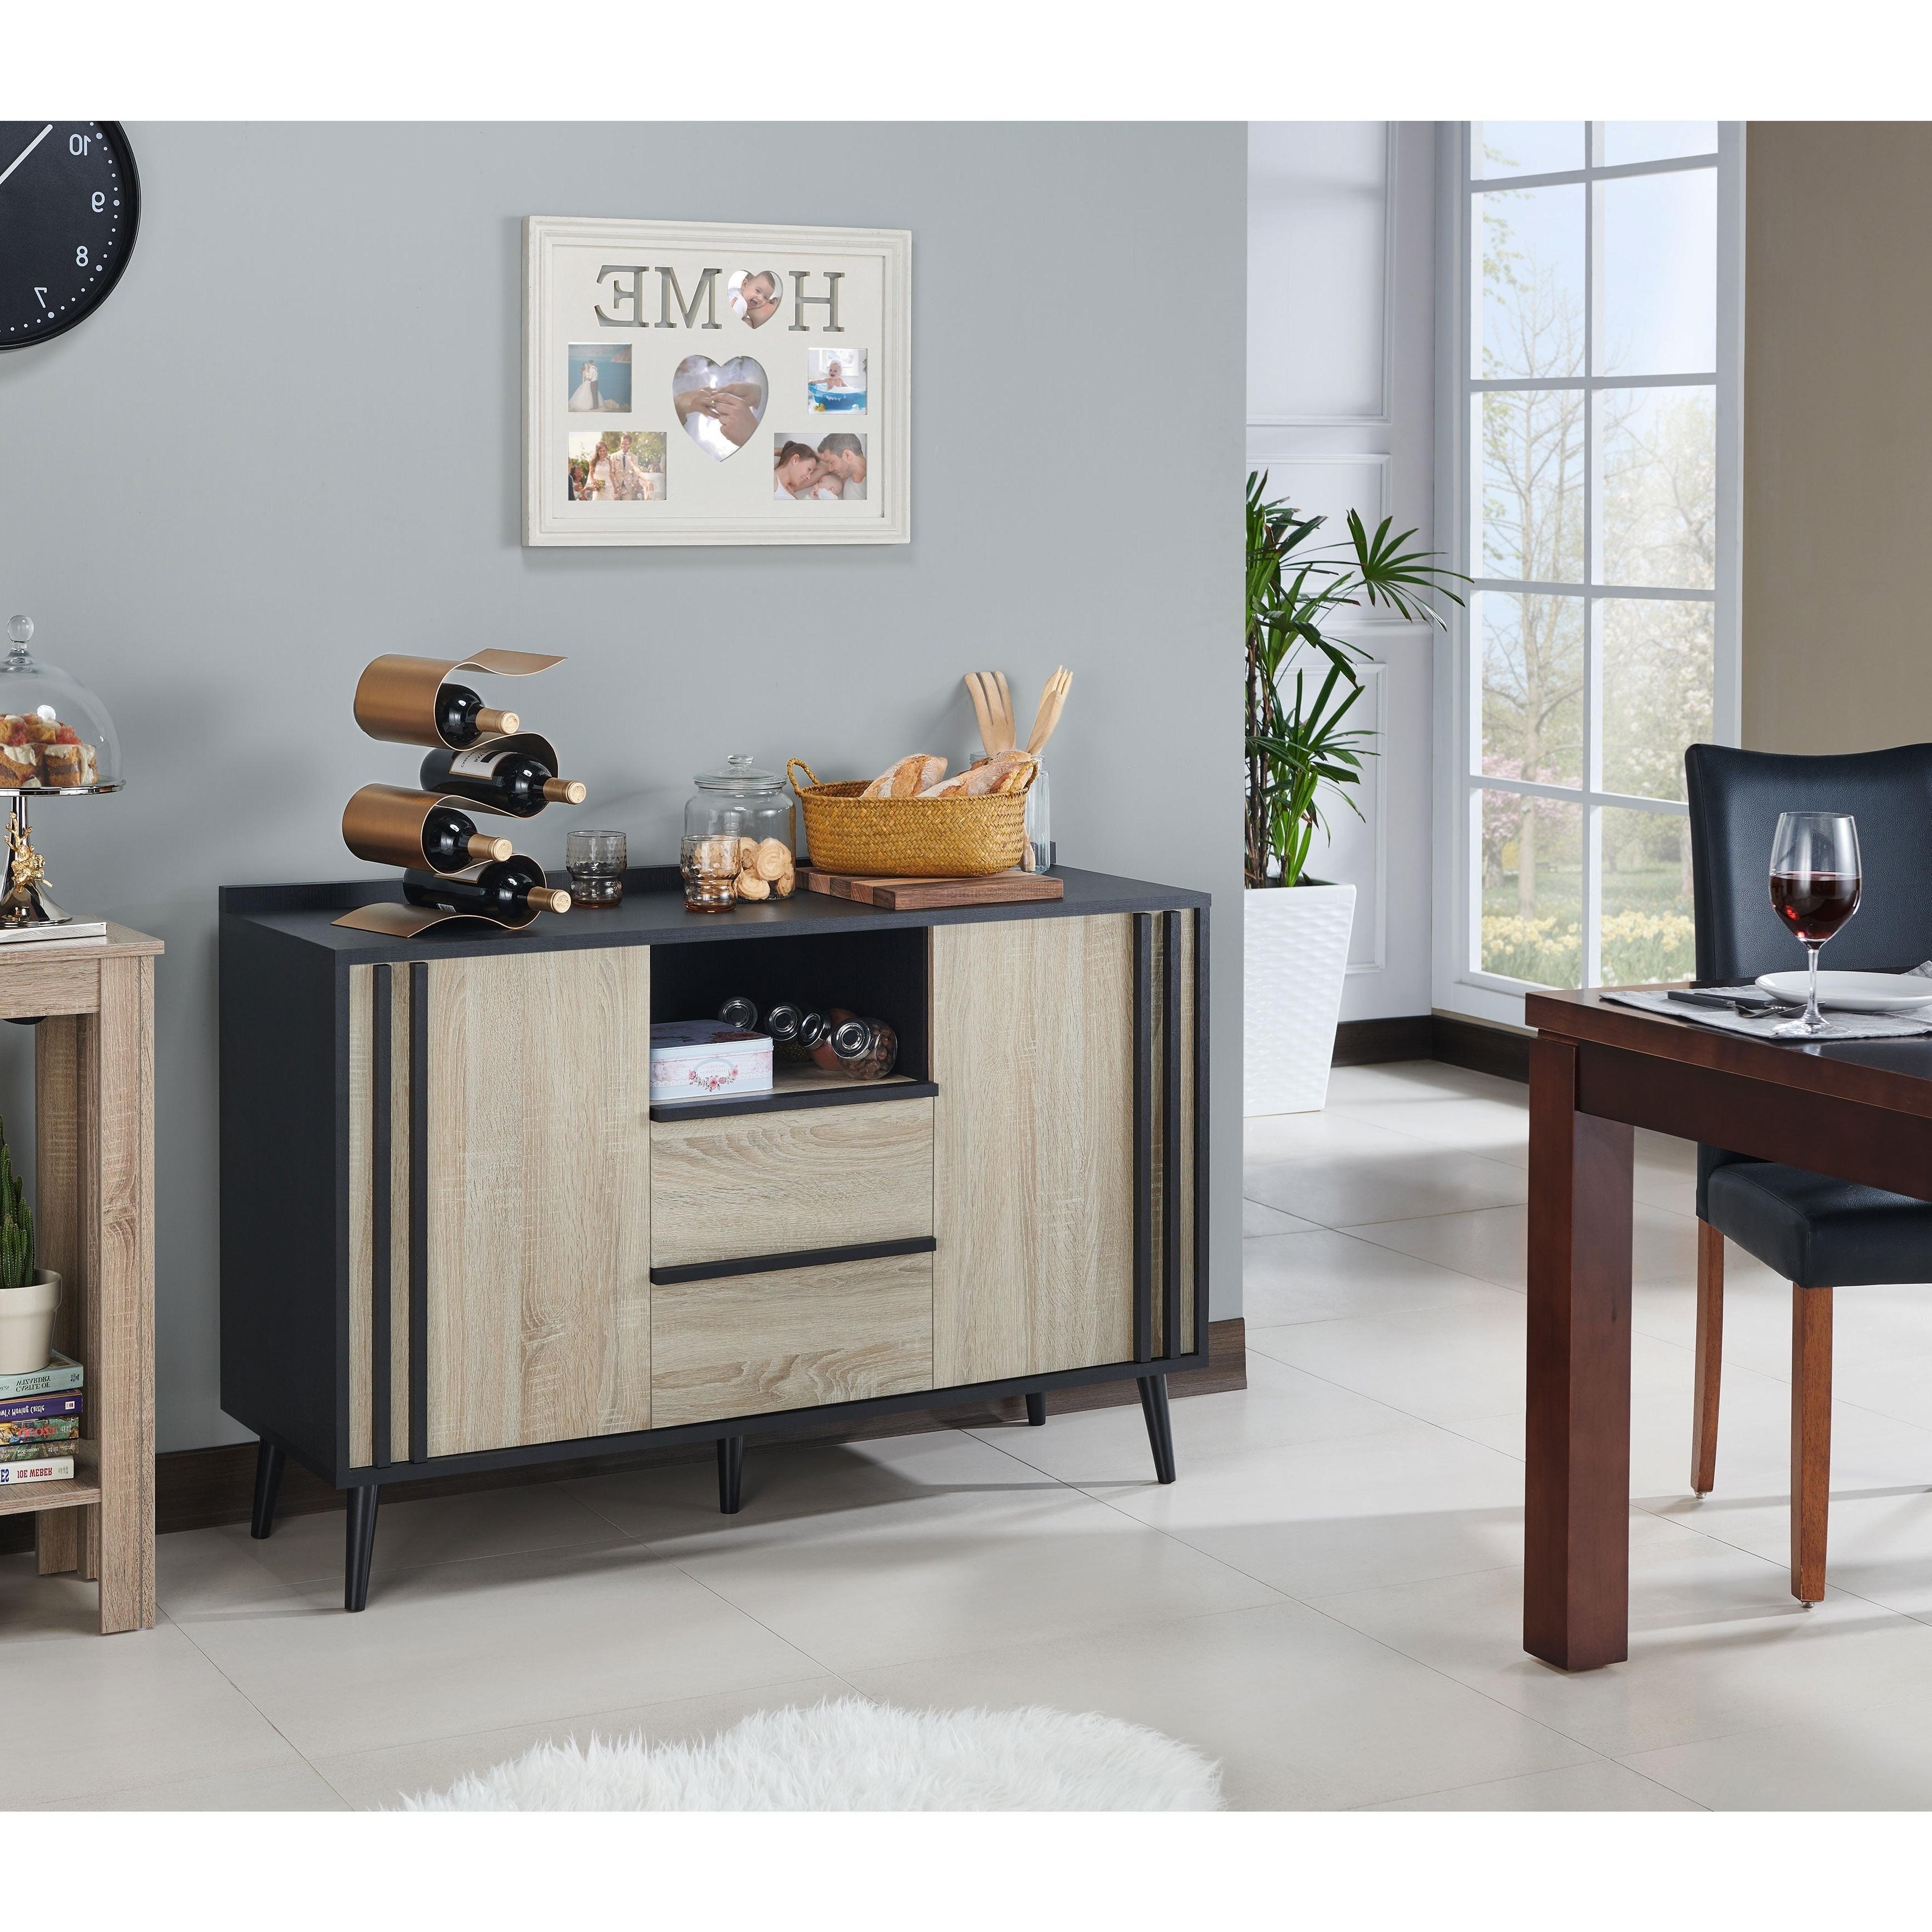 Mandal Mid Century Modern White Oak Buffet Serverfoa Regarding Light White Oak Two Tone Modern Buffets (View 12 of 20)